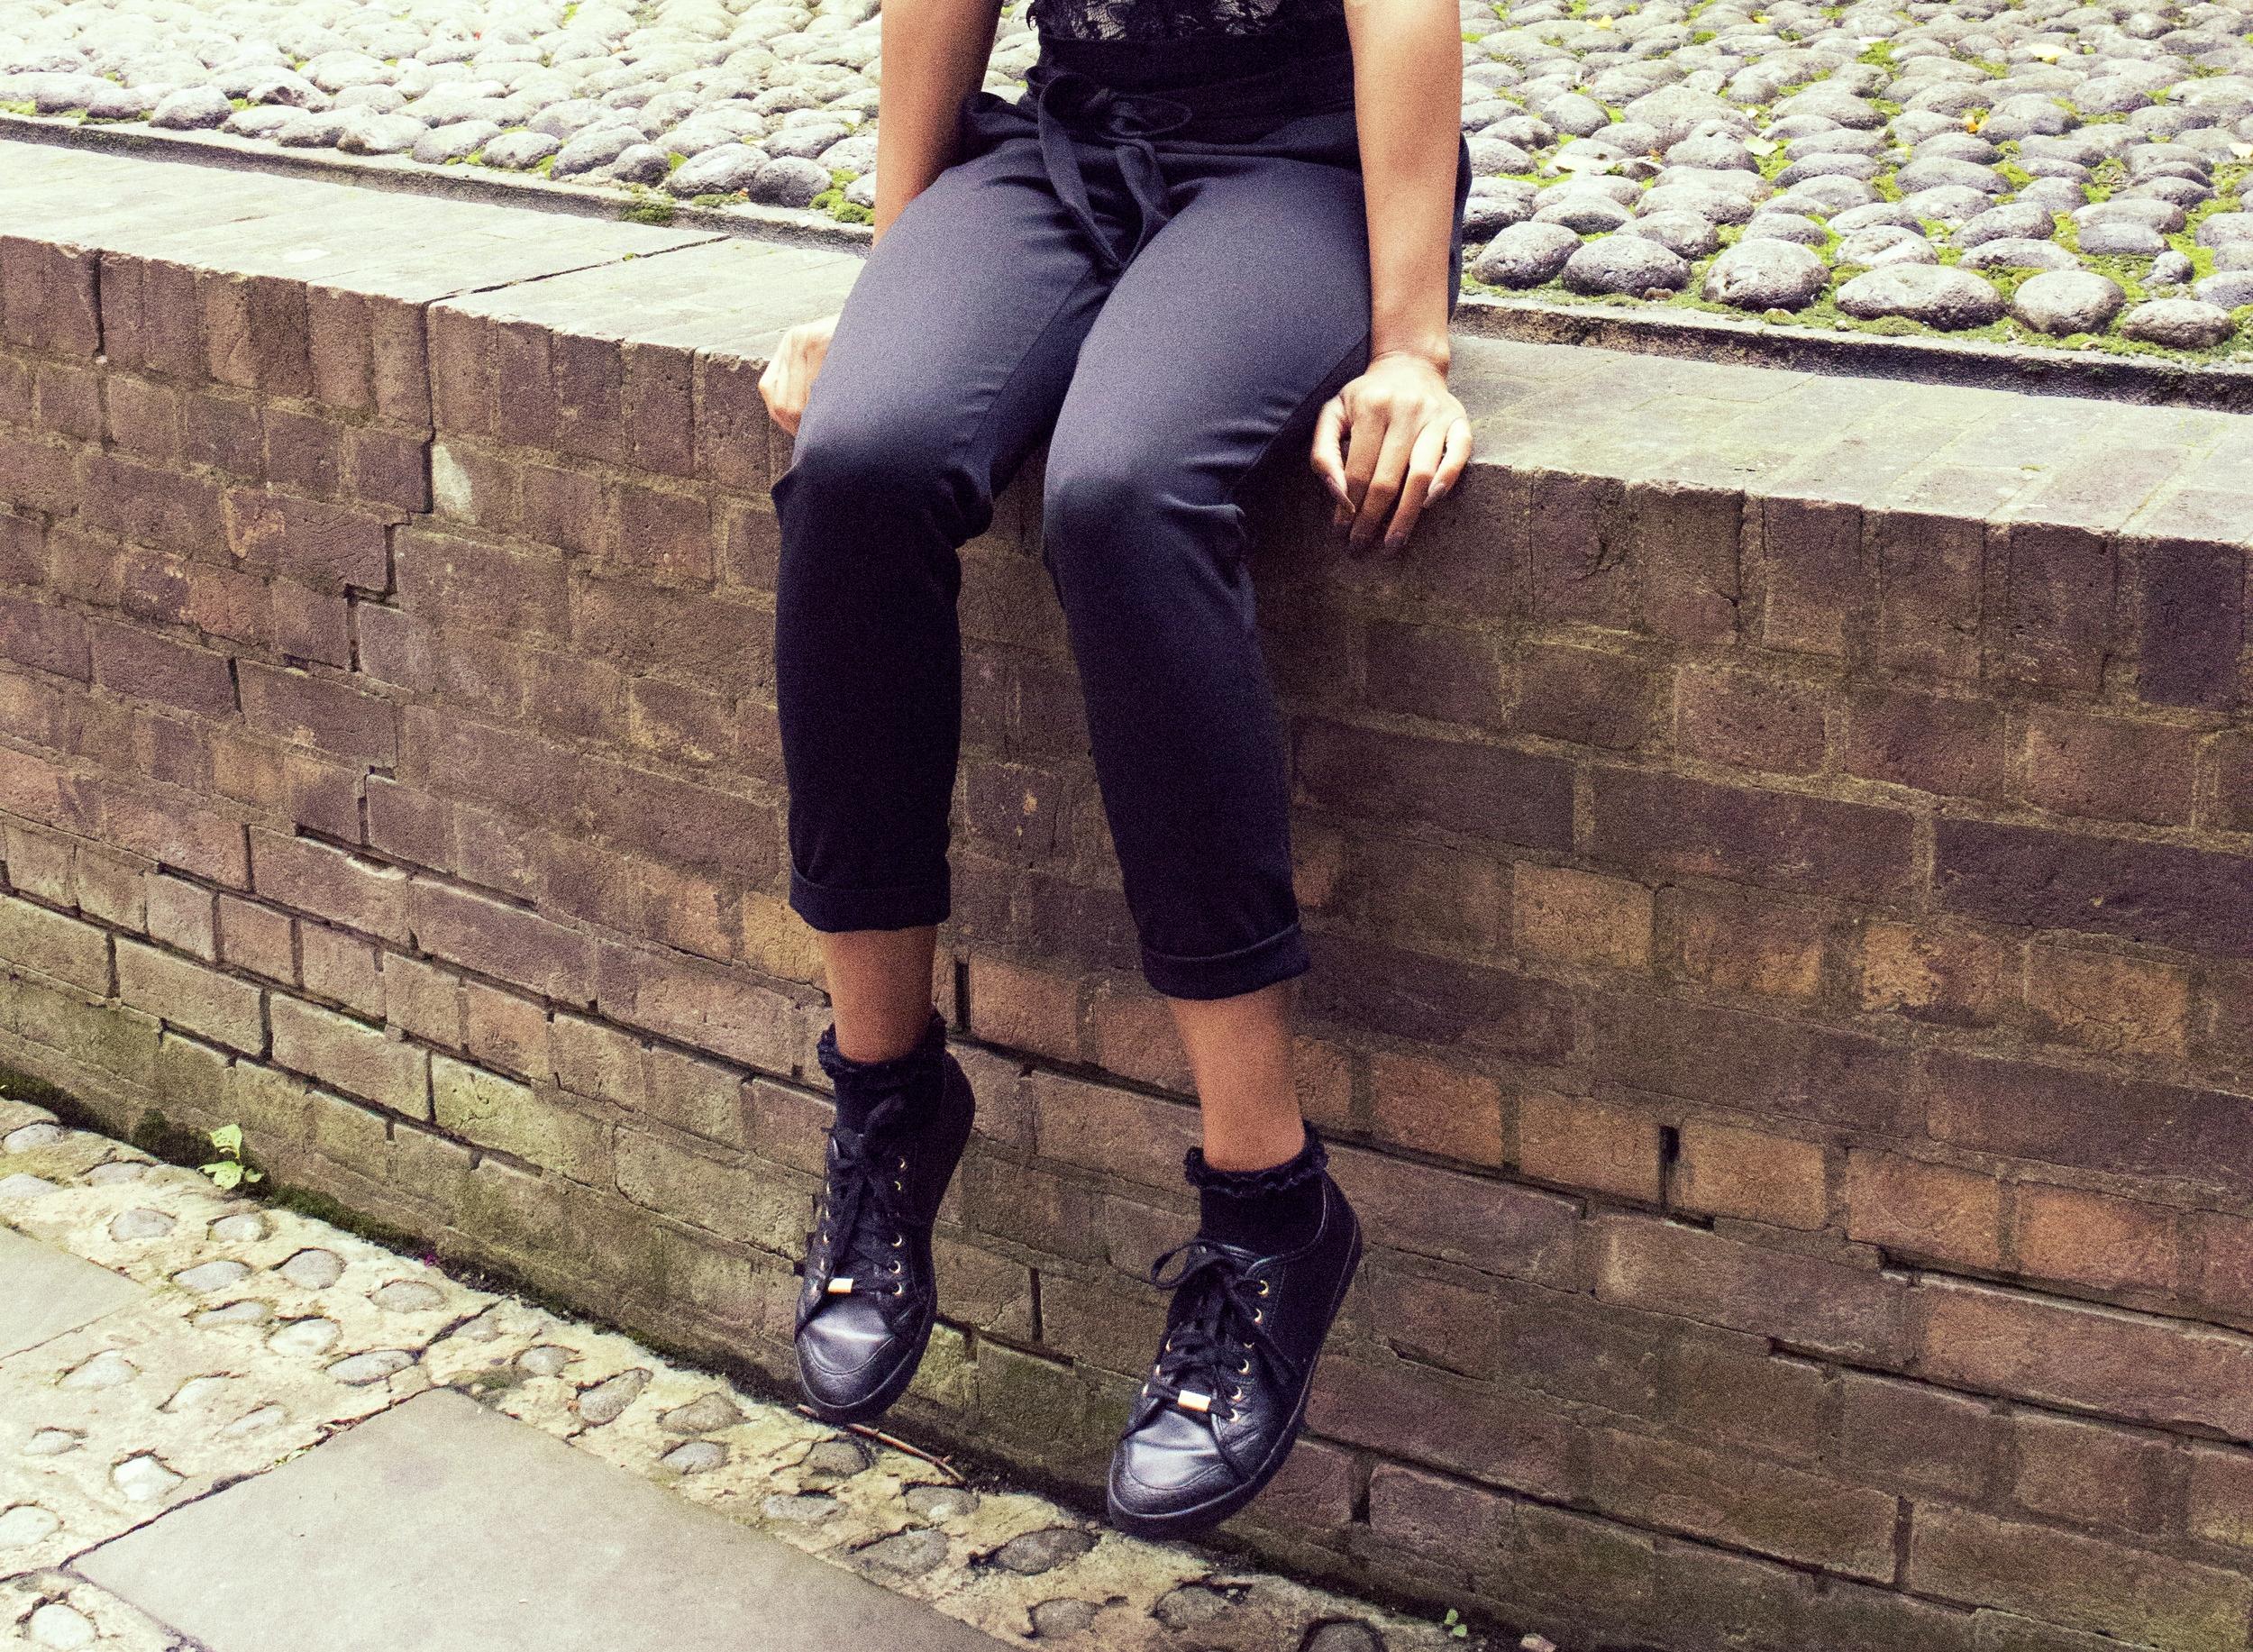 White polo neck black bodysuit black trousers black trainers for Autumn Winter 8.jpg